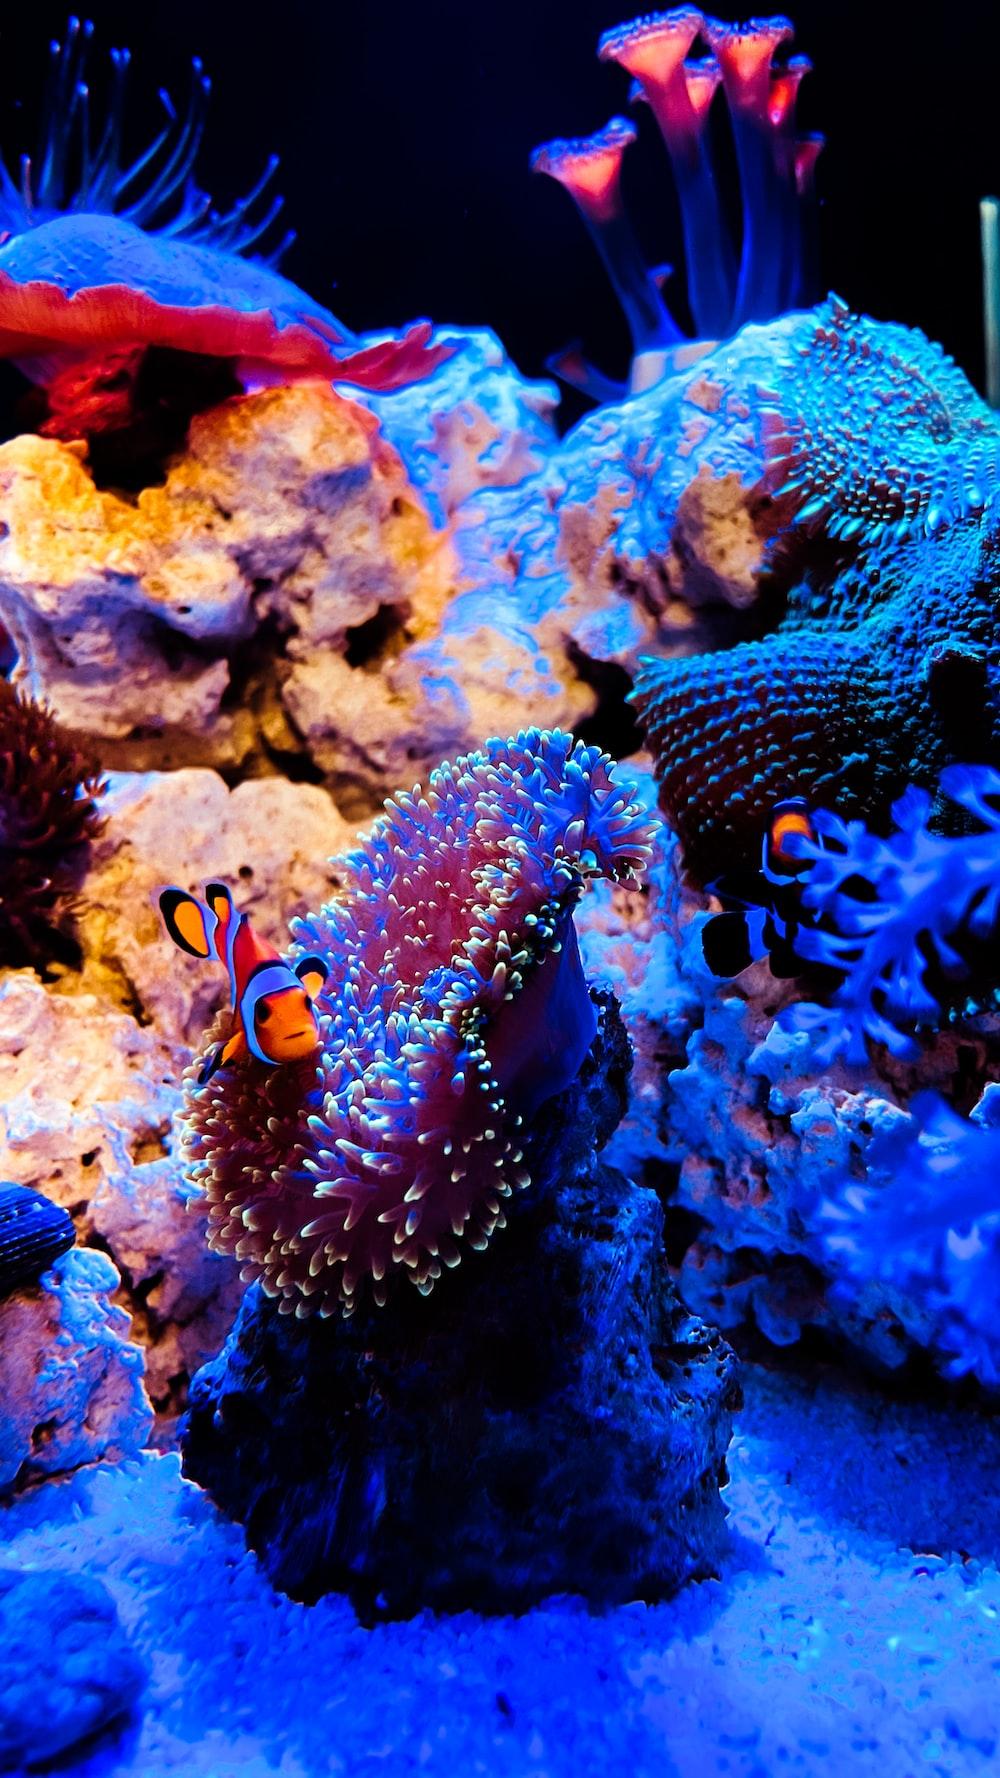 clown fish in body of water